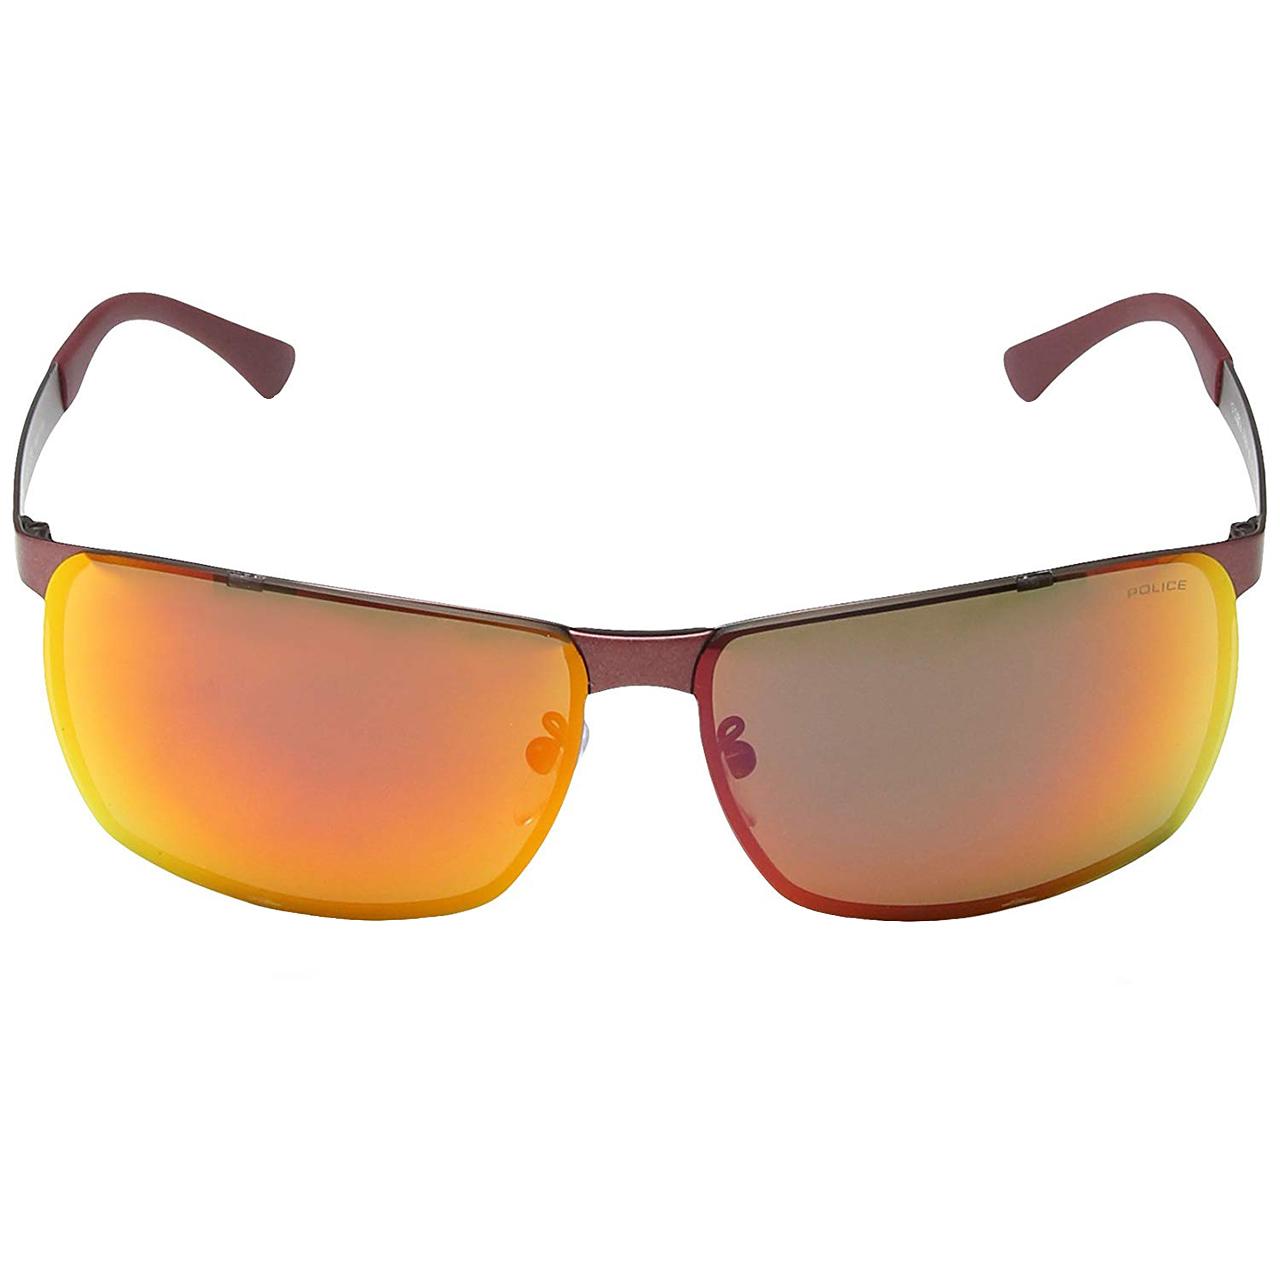 عینک آفتابی پلیس مدل S 8959 COL 8G1R